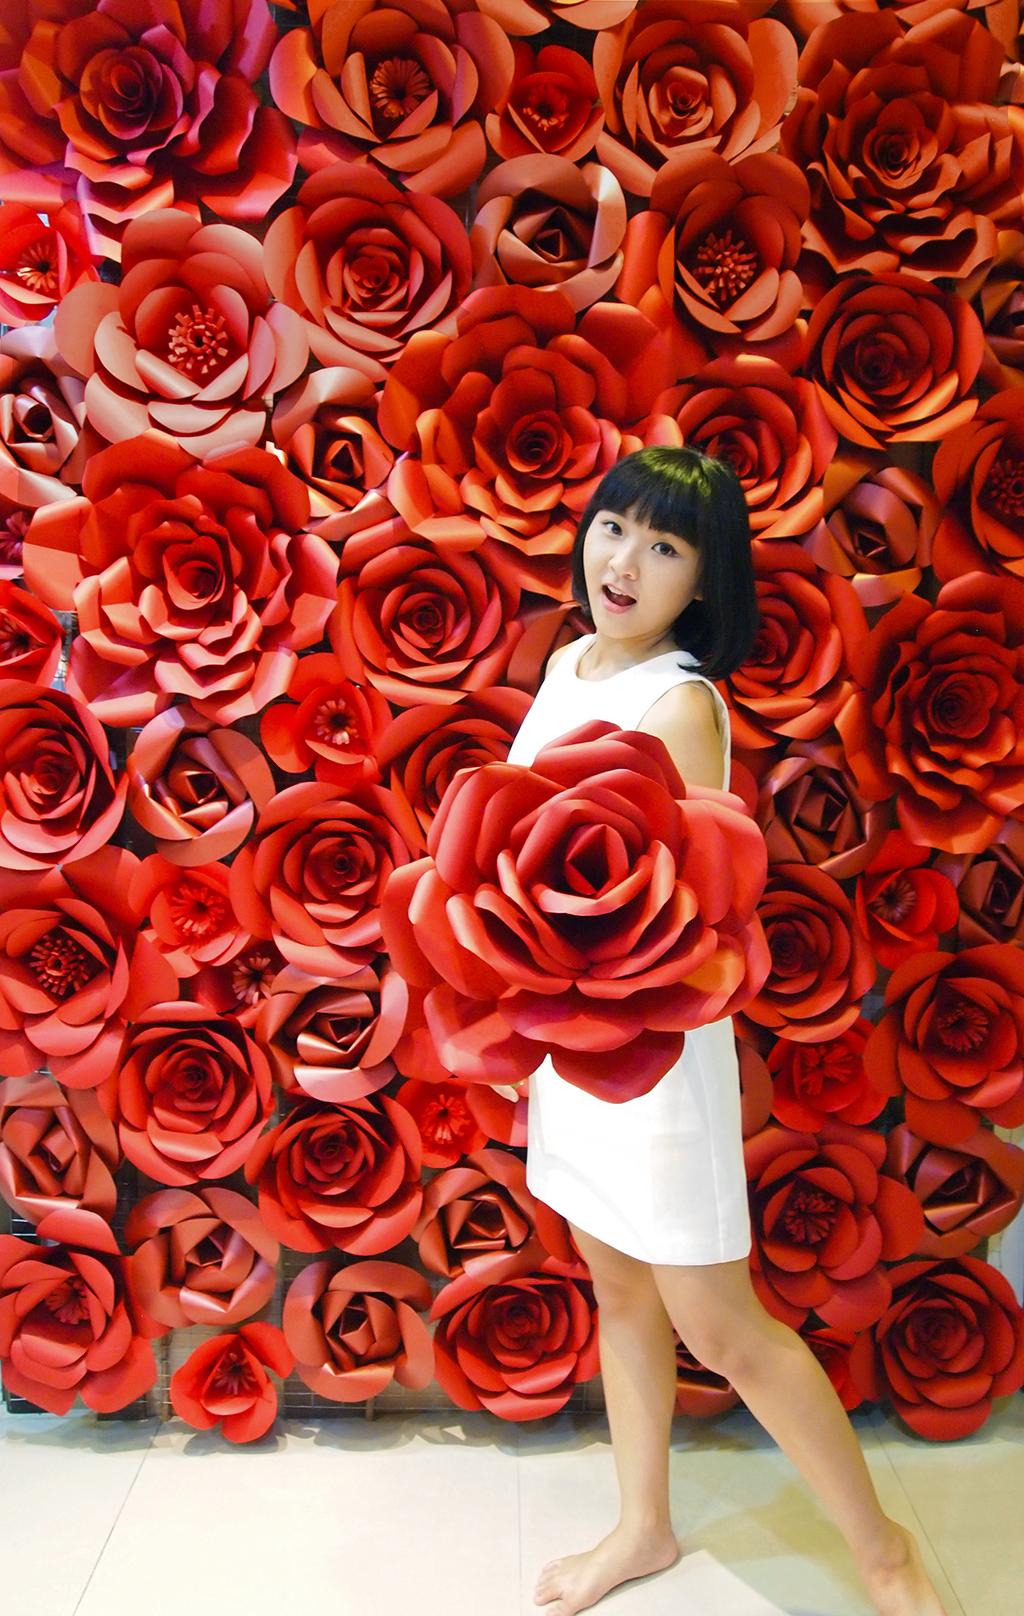 Hwehts Giant Red Paper Flowers Backdrop Redbackdrop